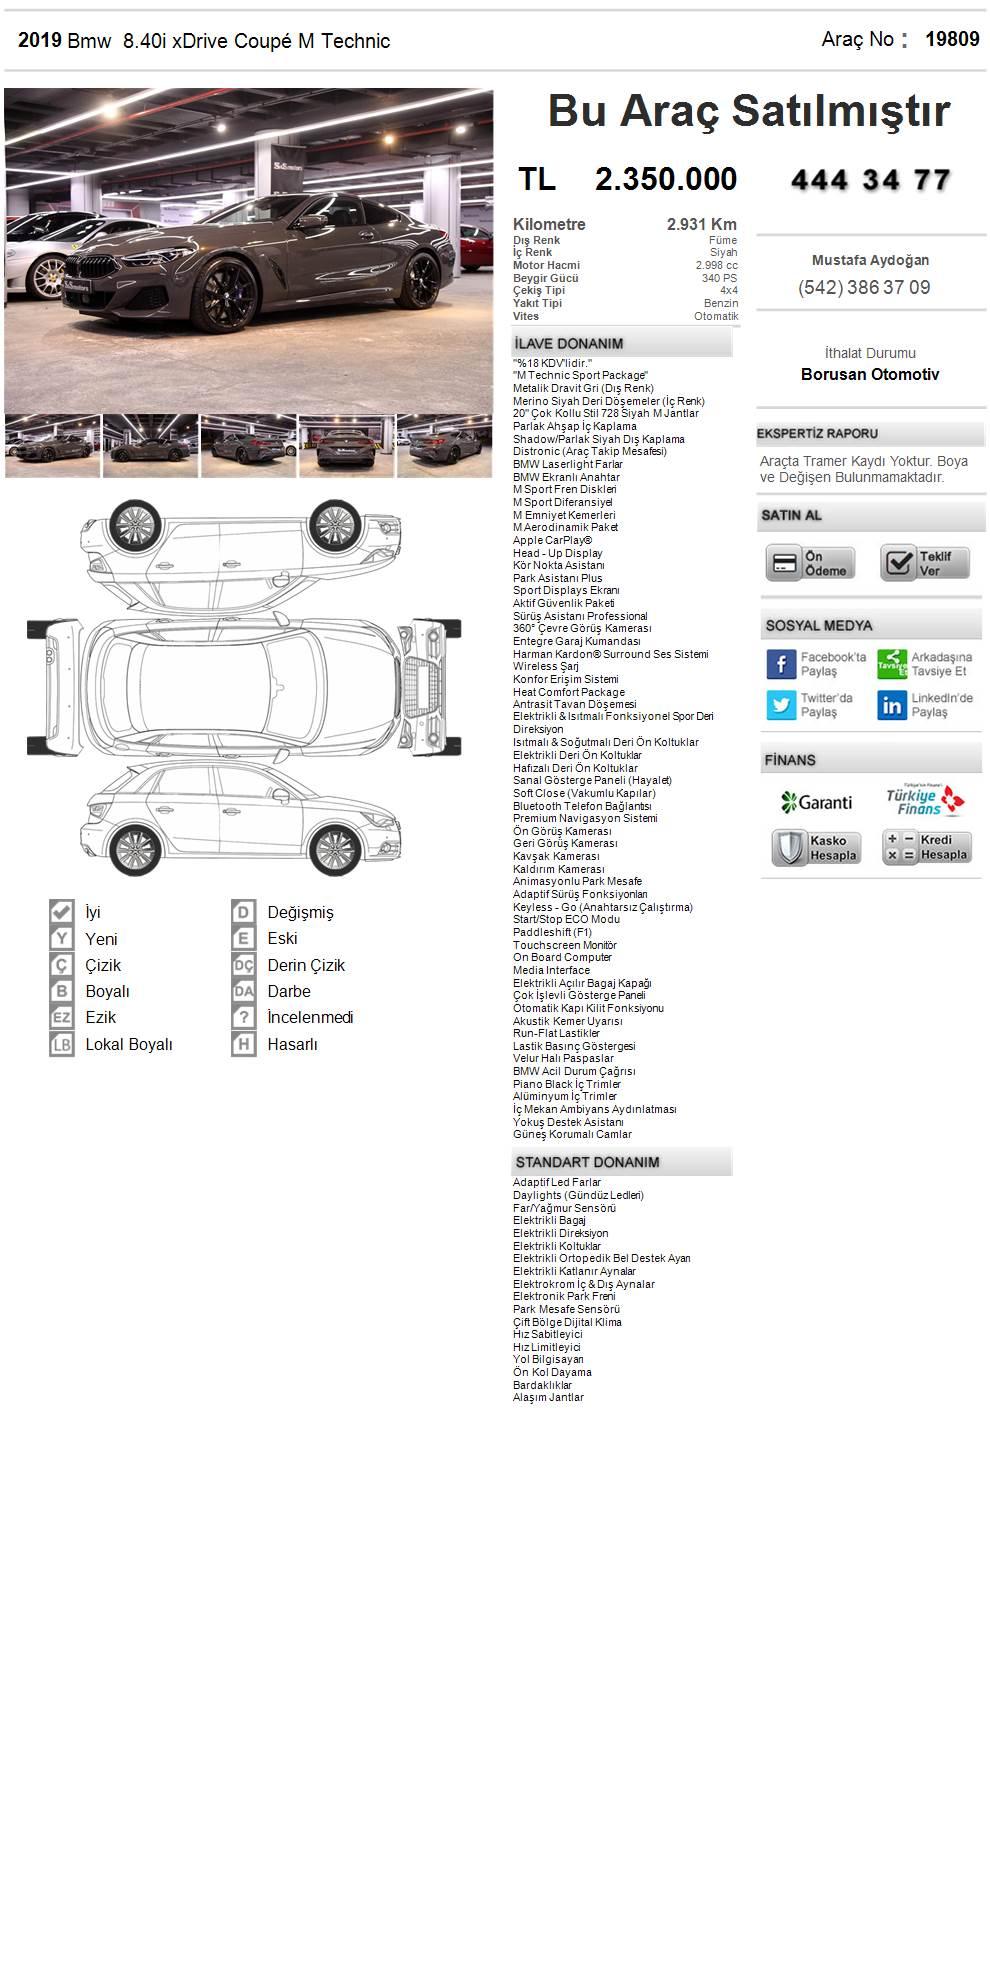 Galeriden Bmw 8 Serisi 840i Xdrive 2019 Model Istanbul 2 931 Km